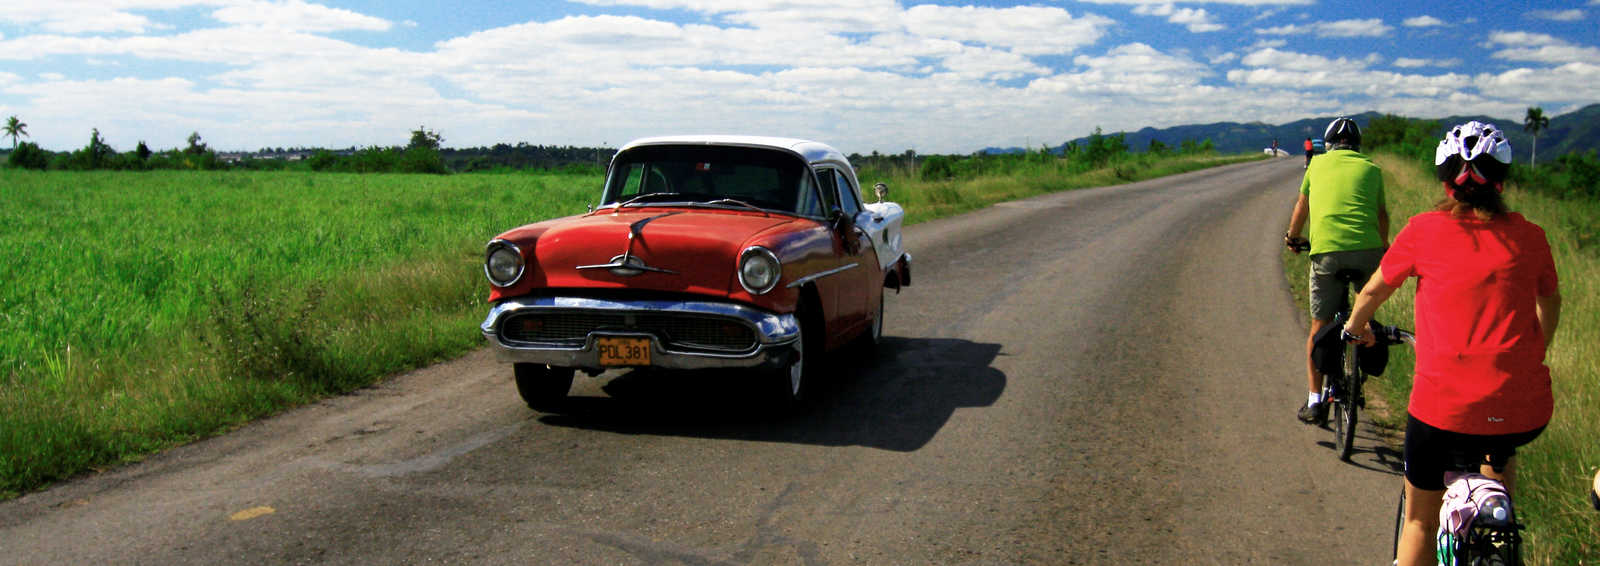 Cycling through iconic Cuba